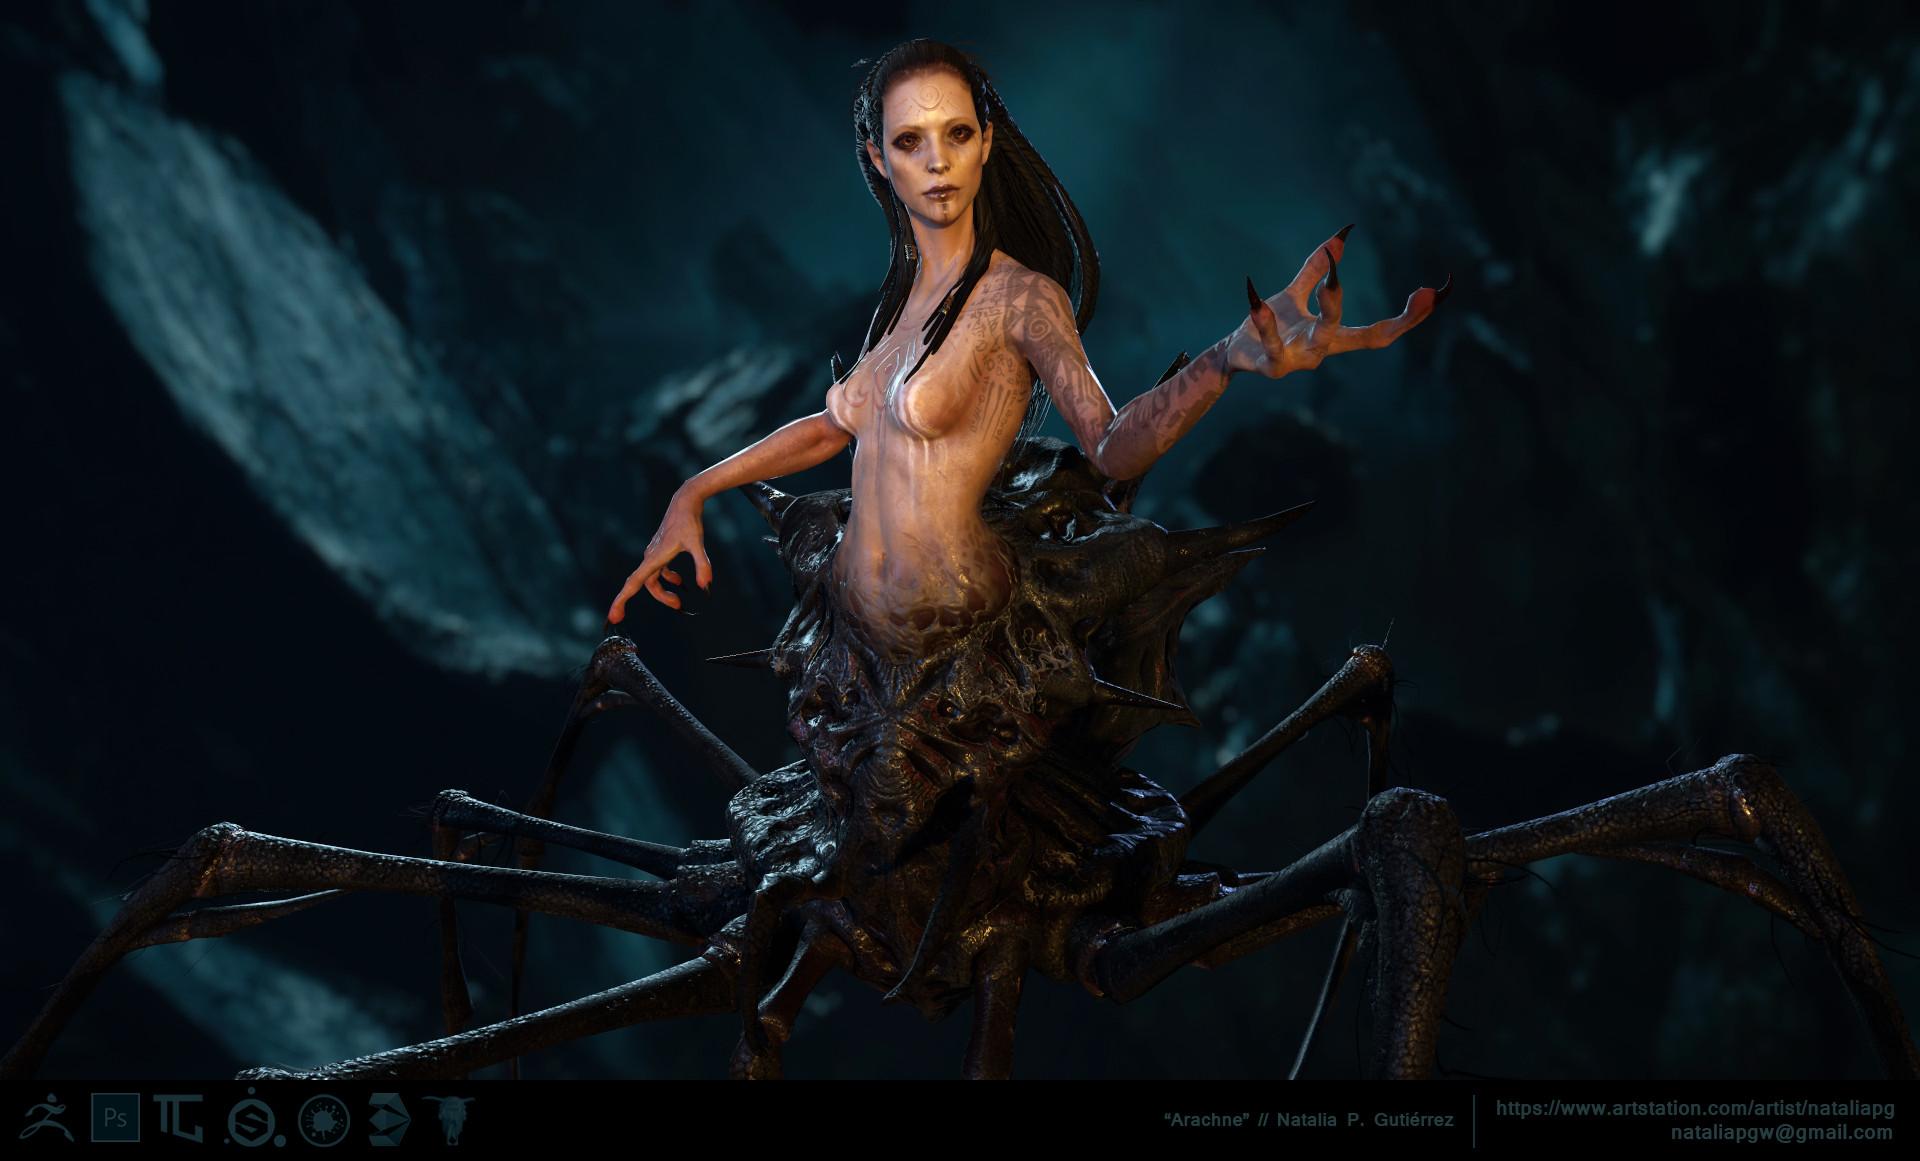 Natalia p gutierrez arachneview 3